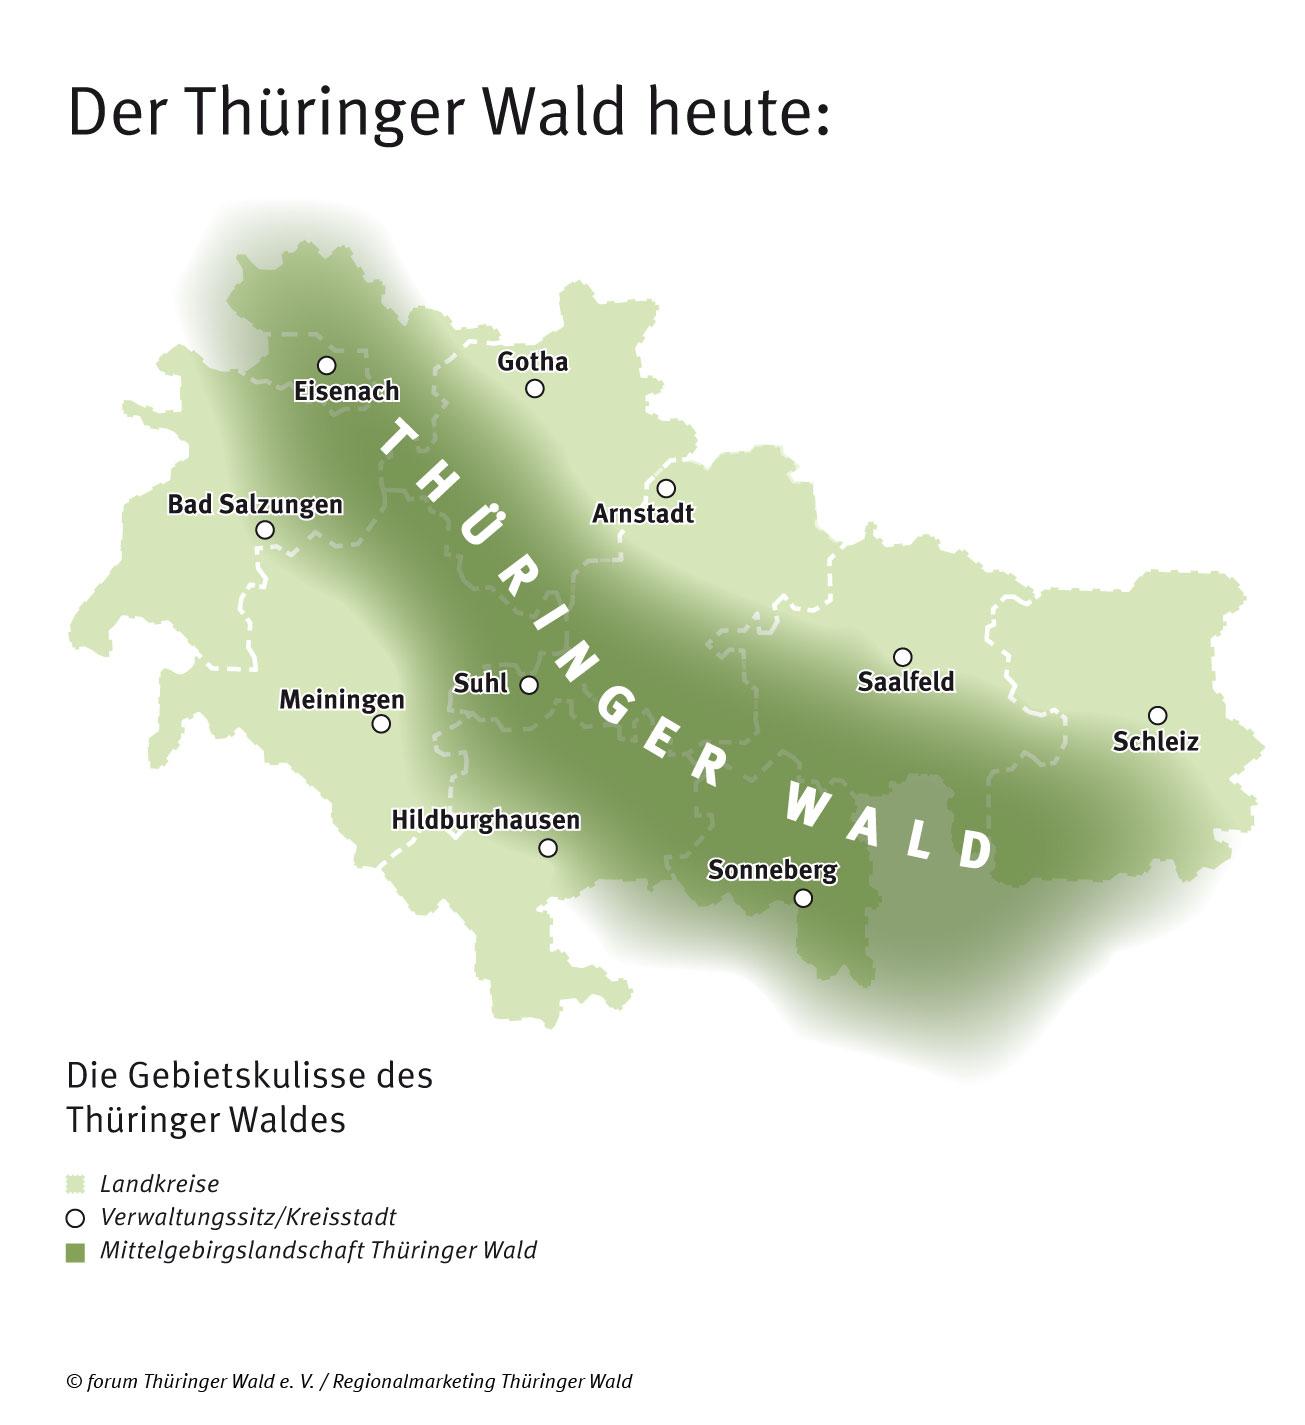 Die Gebietskulisse des Thüringer Waldes heute